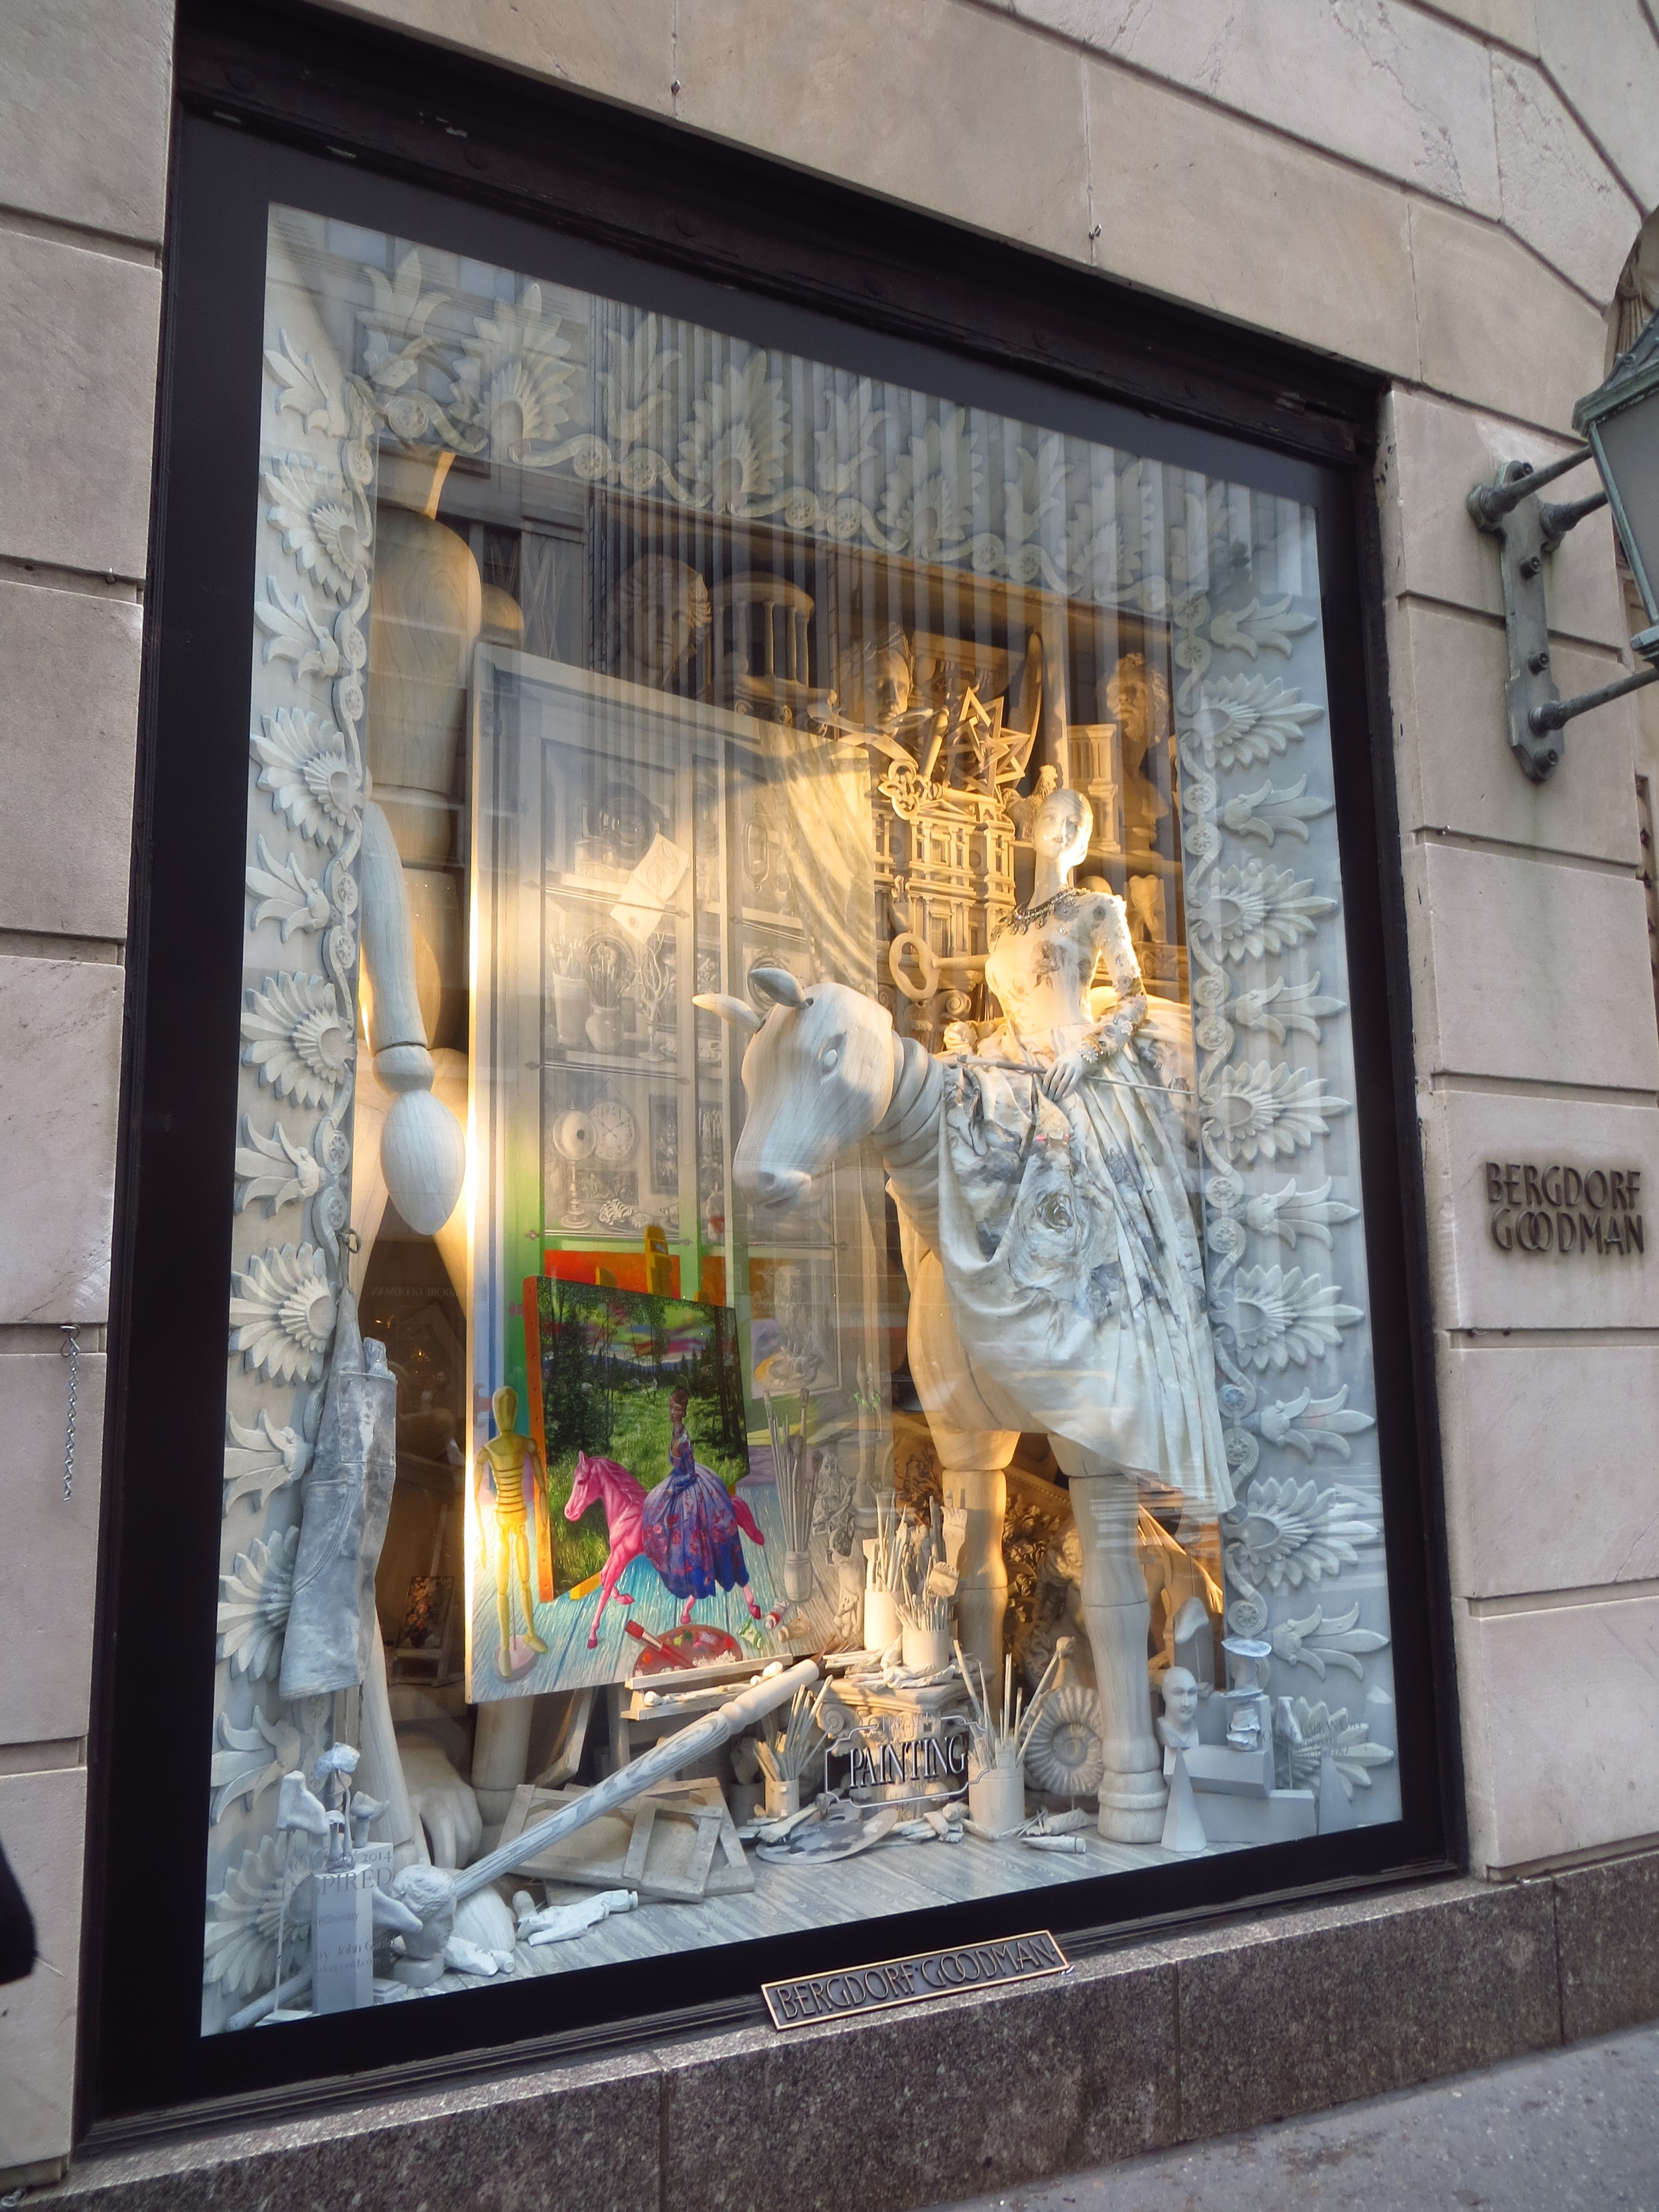 Holiday Window (Bergdorf Goodman)